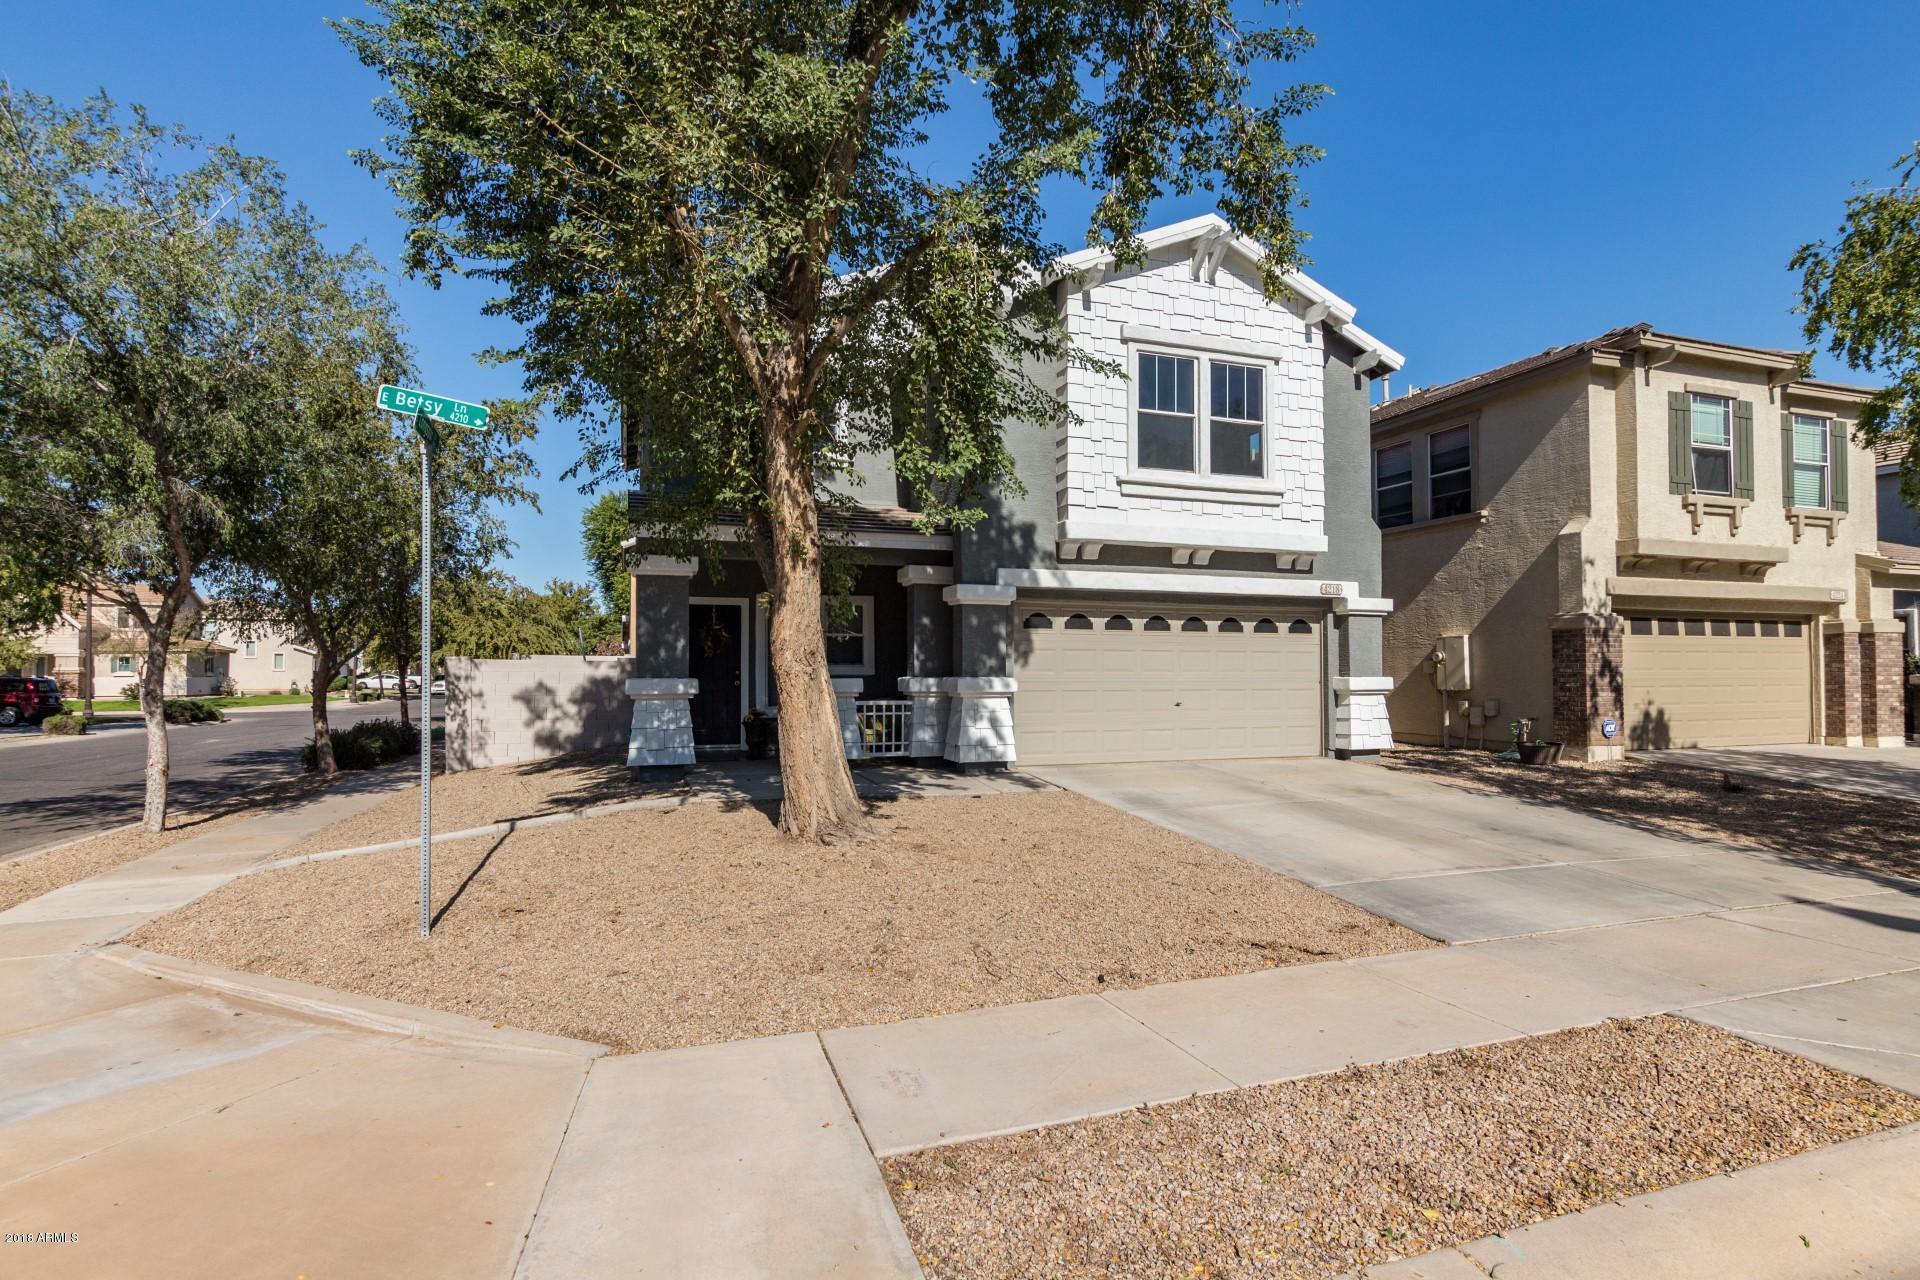 MLS 5845574 4218 E BETSY Lane, Gilbert, AZ 85296 Gilbert AZ The Gardens